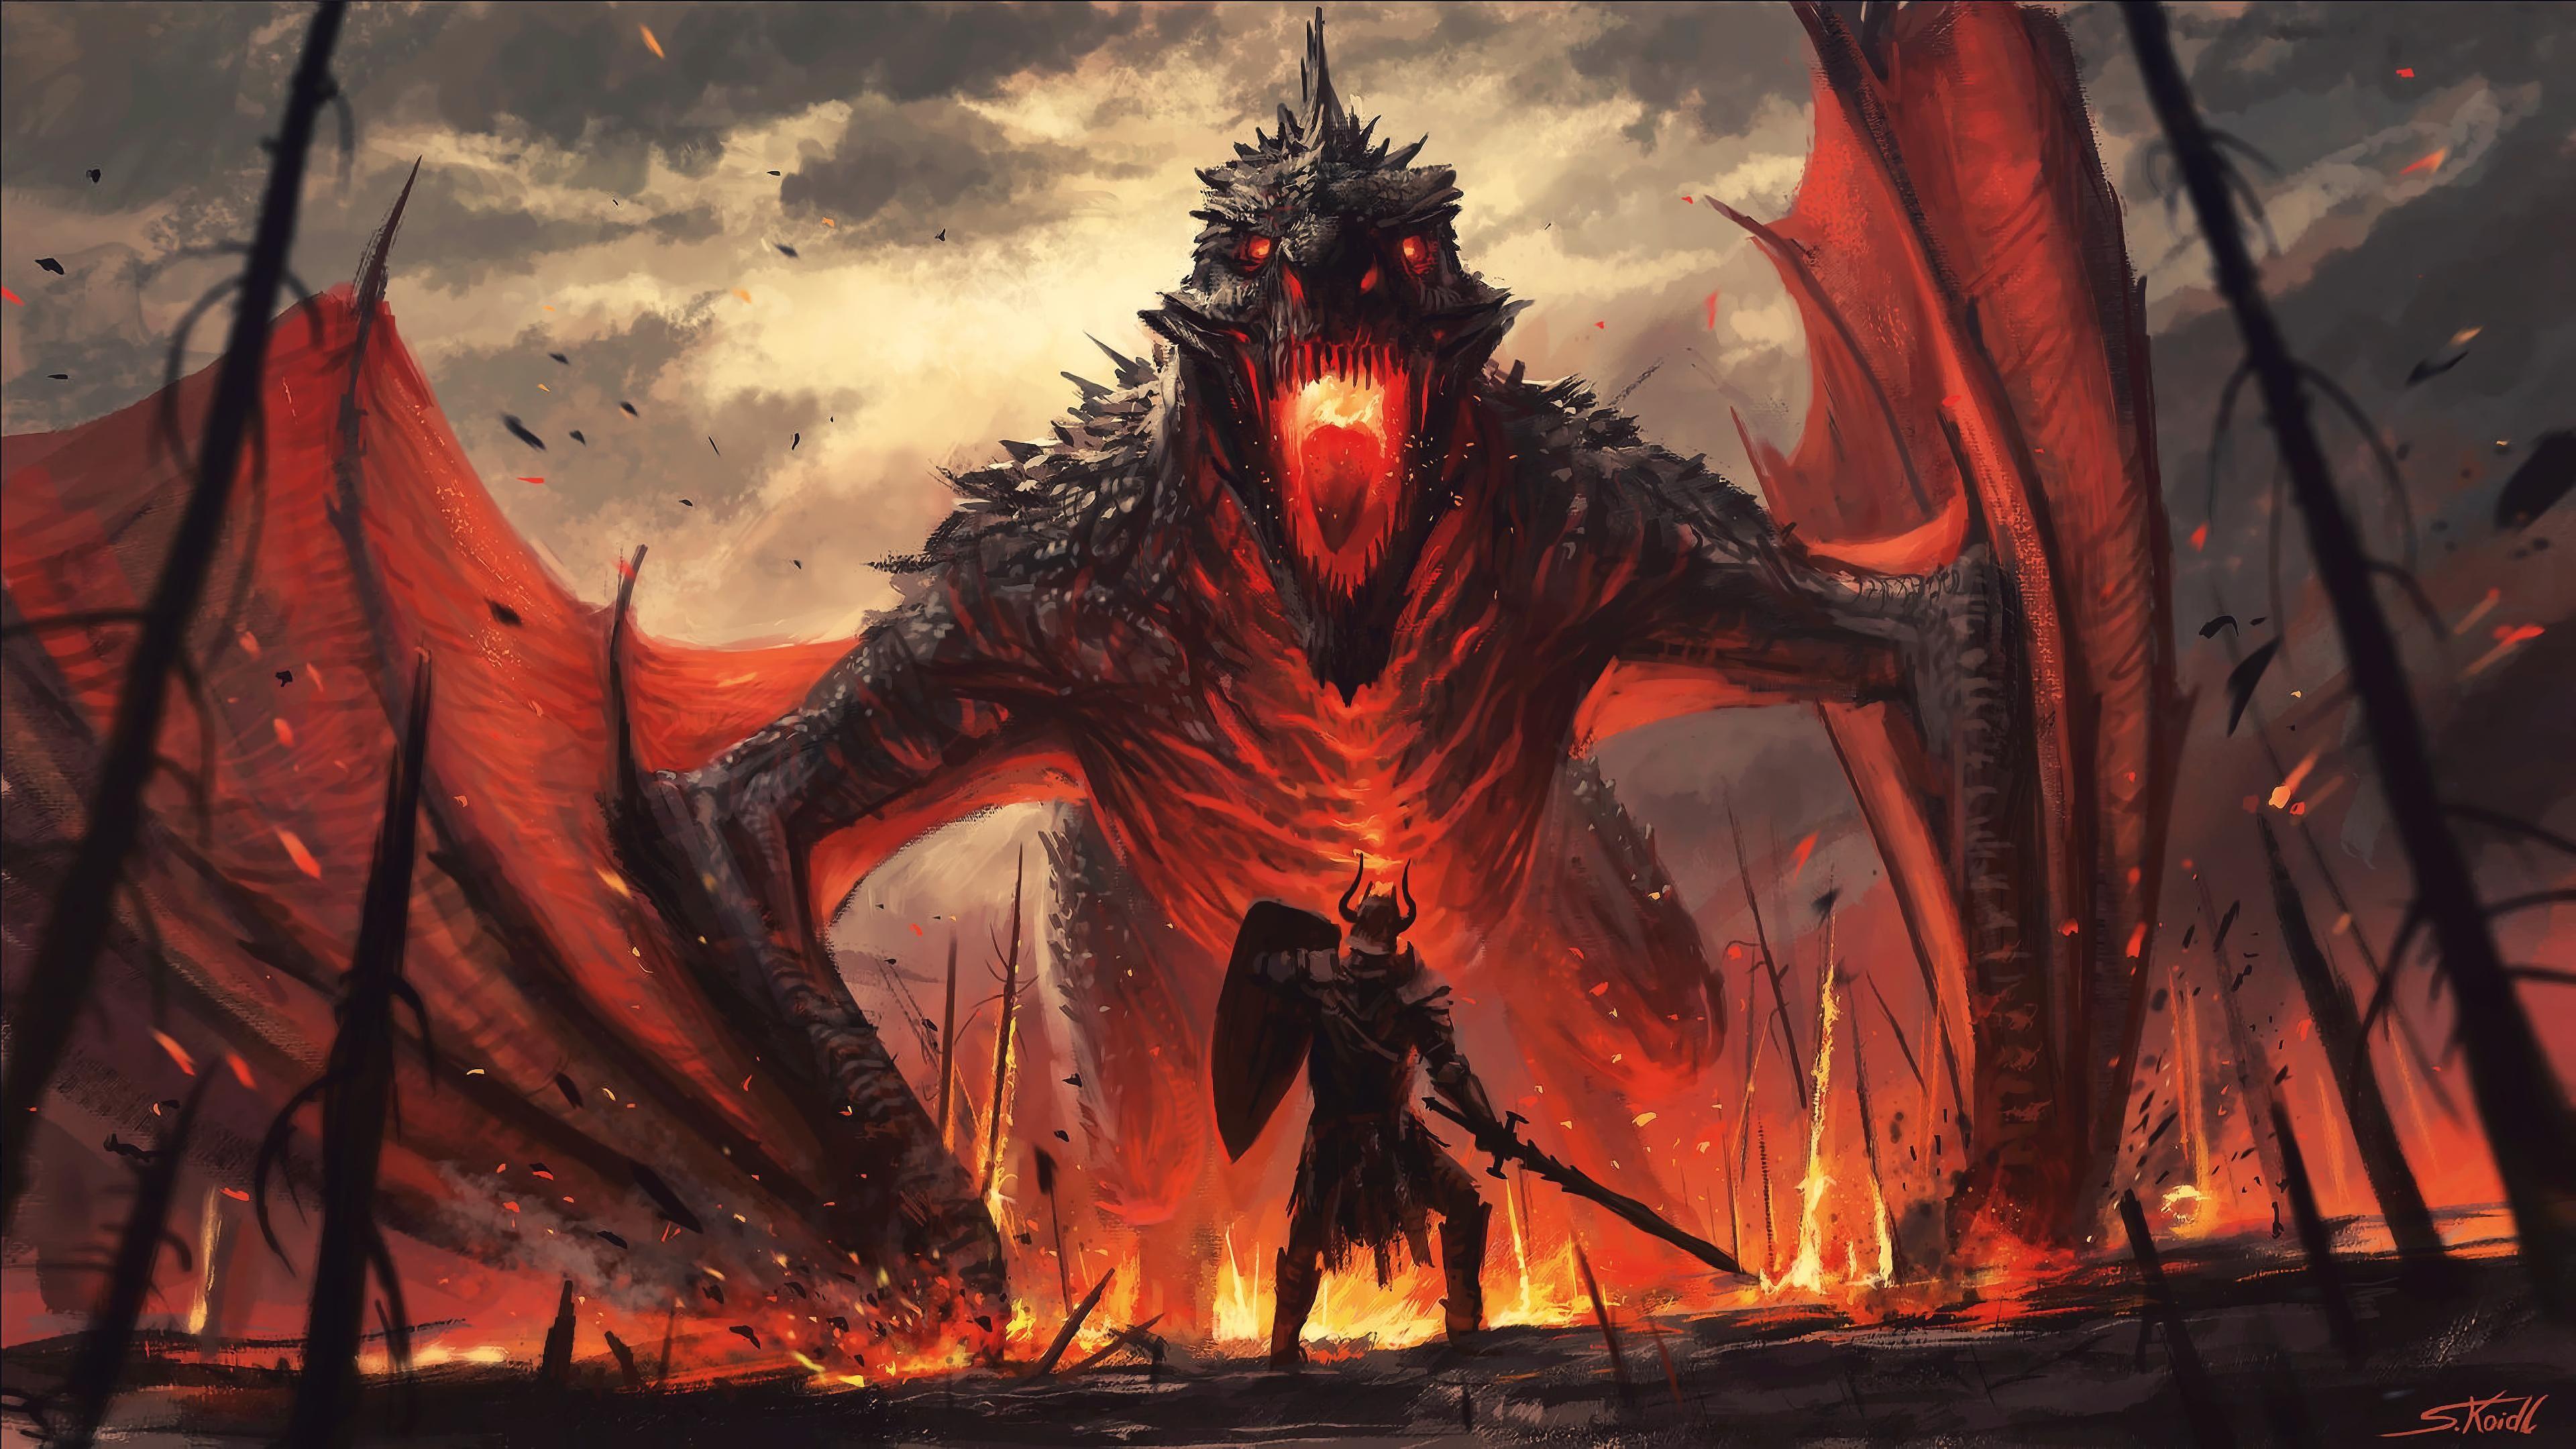 Wyvren Slayer 4k Wallpaper Dragon Artwork Buy Abstract Painting Buy Art Artworks